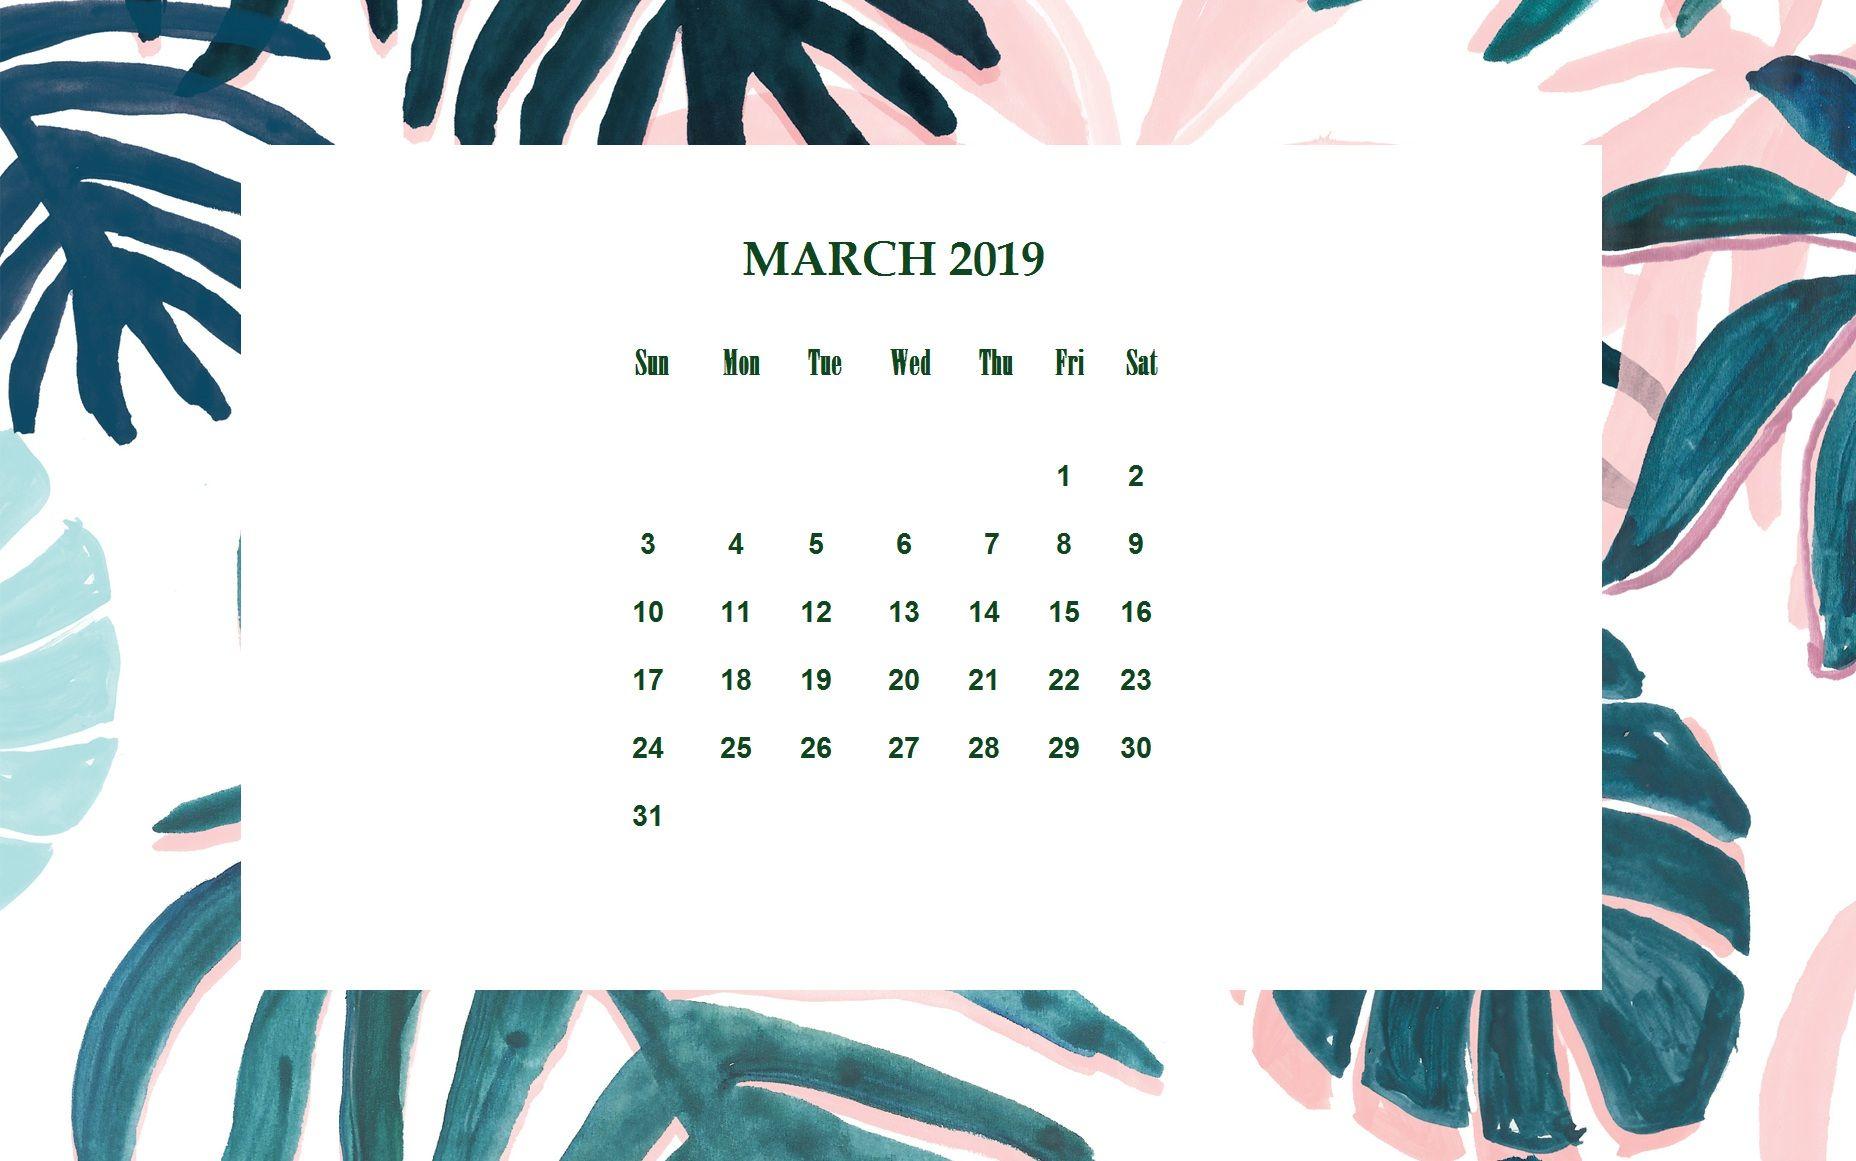 Floral March 2019 Desktop Calendar